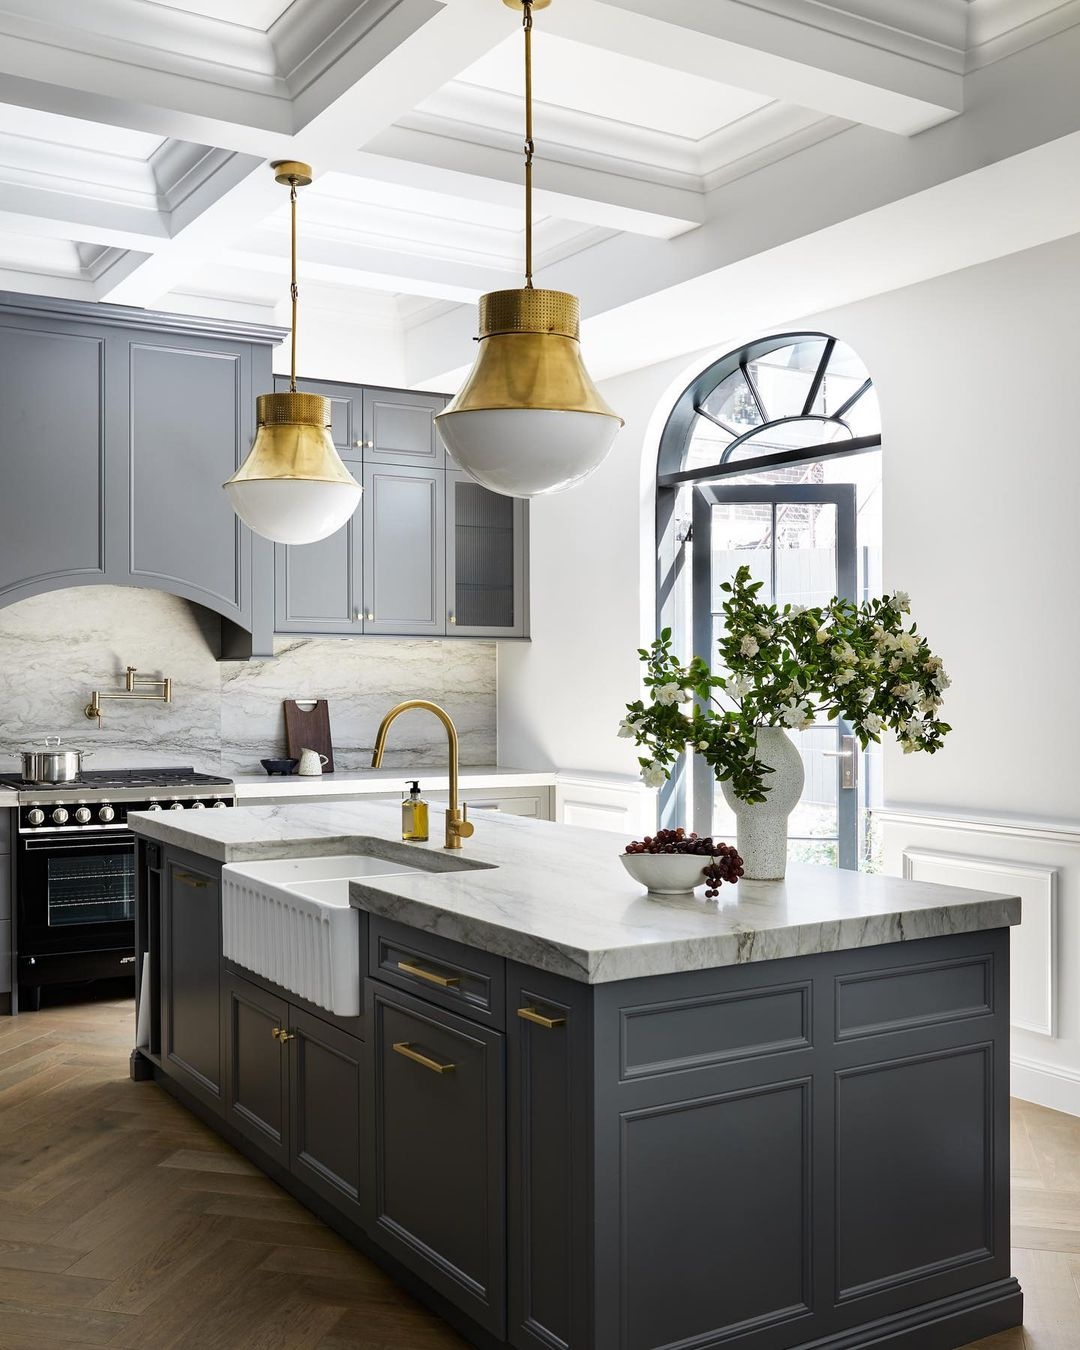 sydney Discover The Best Interior Designers From Sydney harperlanedesign 13210527113451676091565898103415083574103321n 1